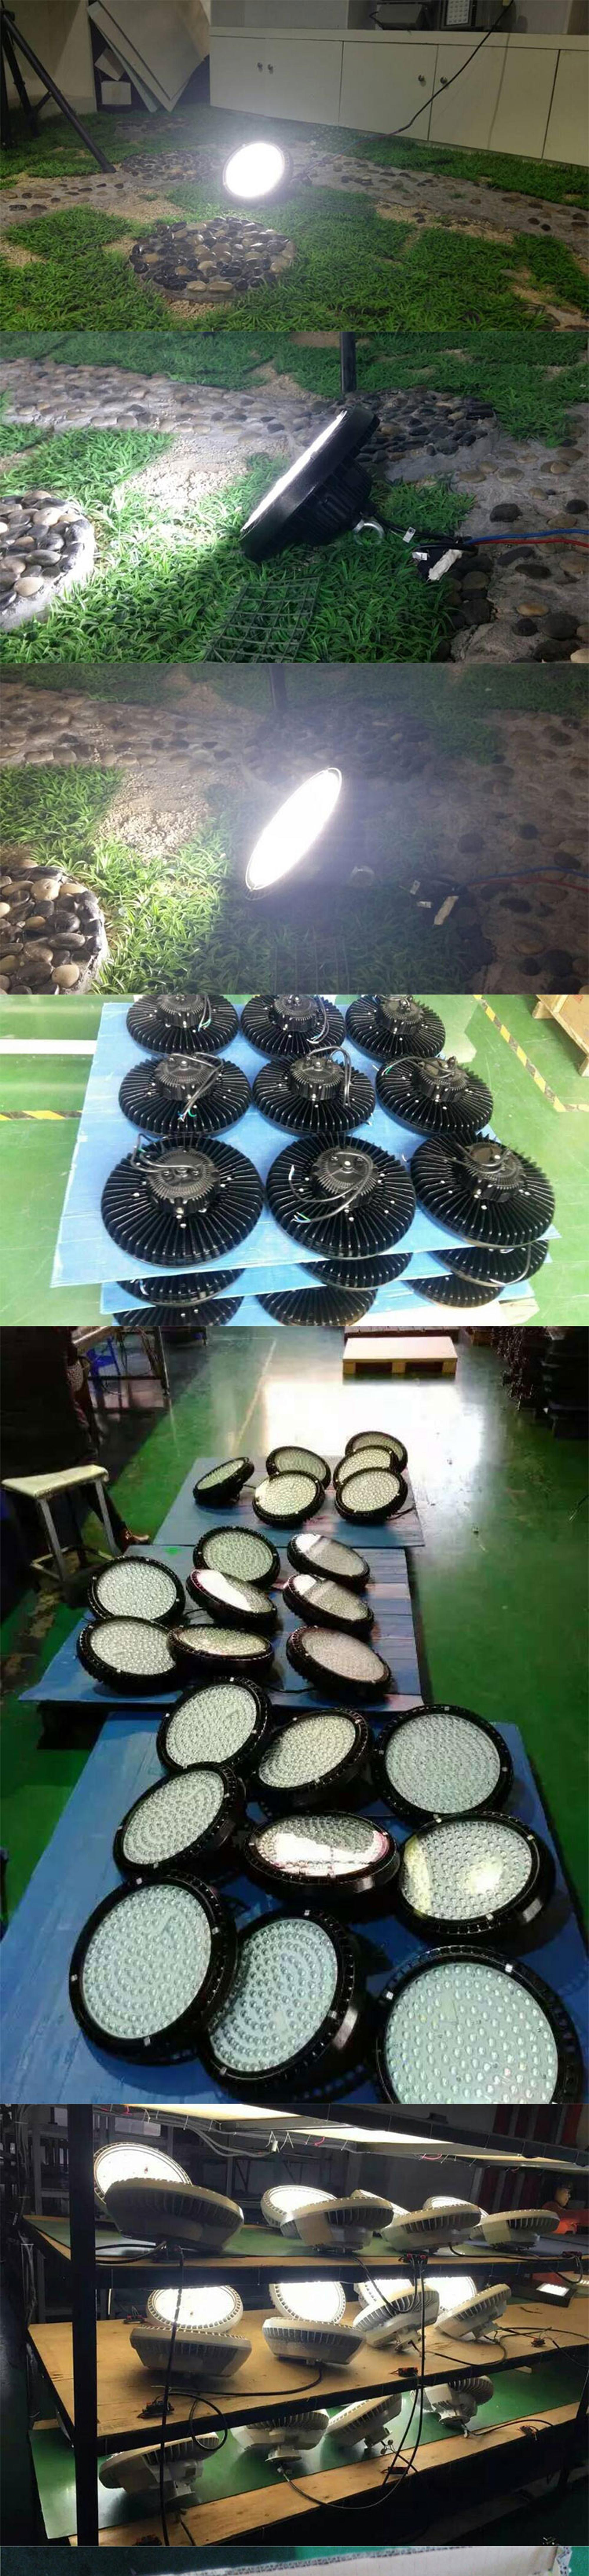 ETL DLC Explosion Proof Top Quality High Luminous Efficiency 100W 120W 150W 300W SMD LED UFO Highbay High Low Bay Light